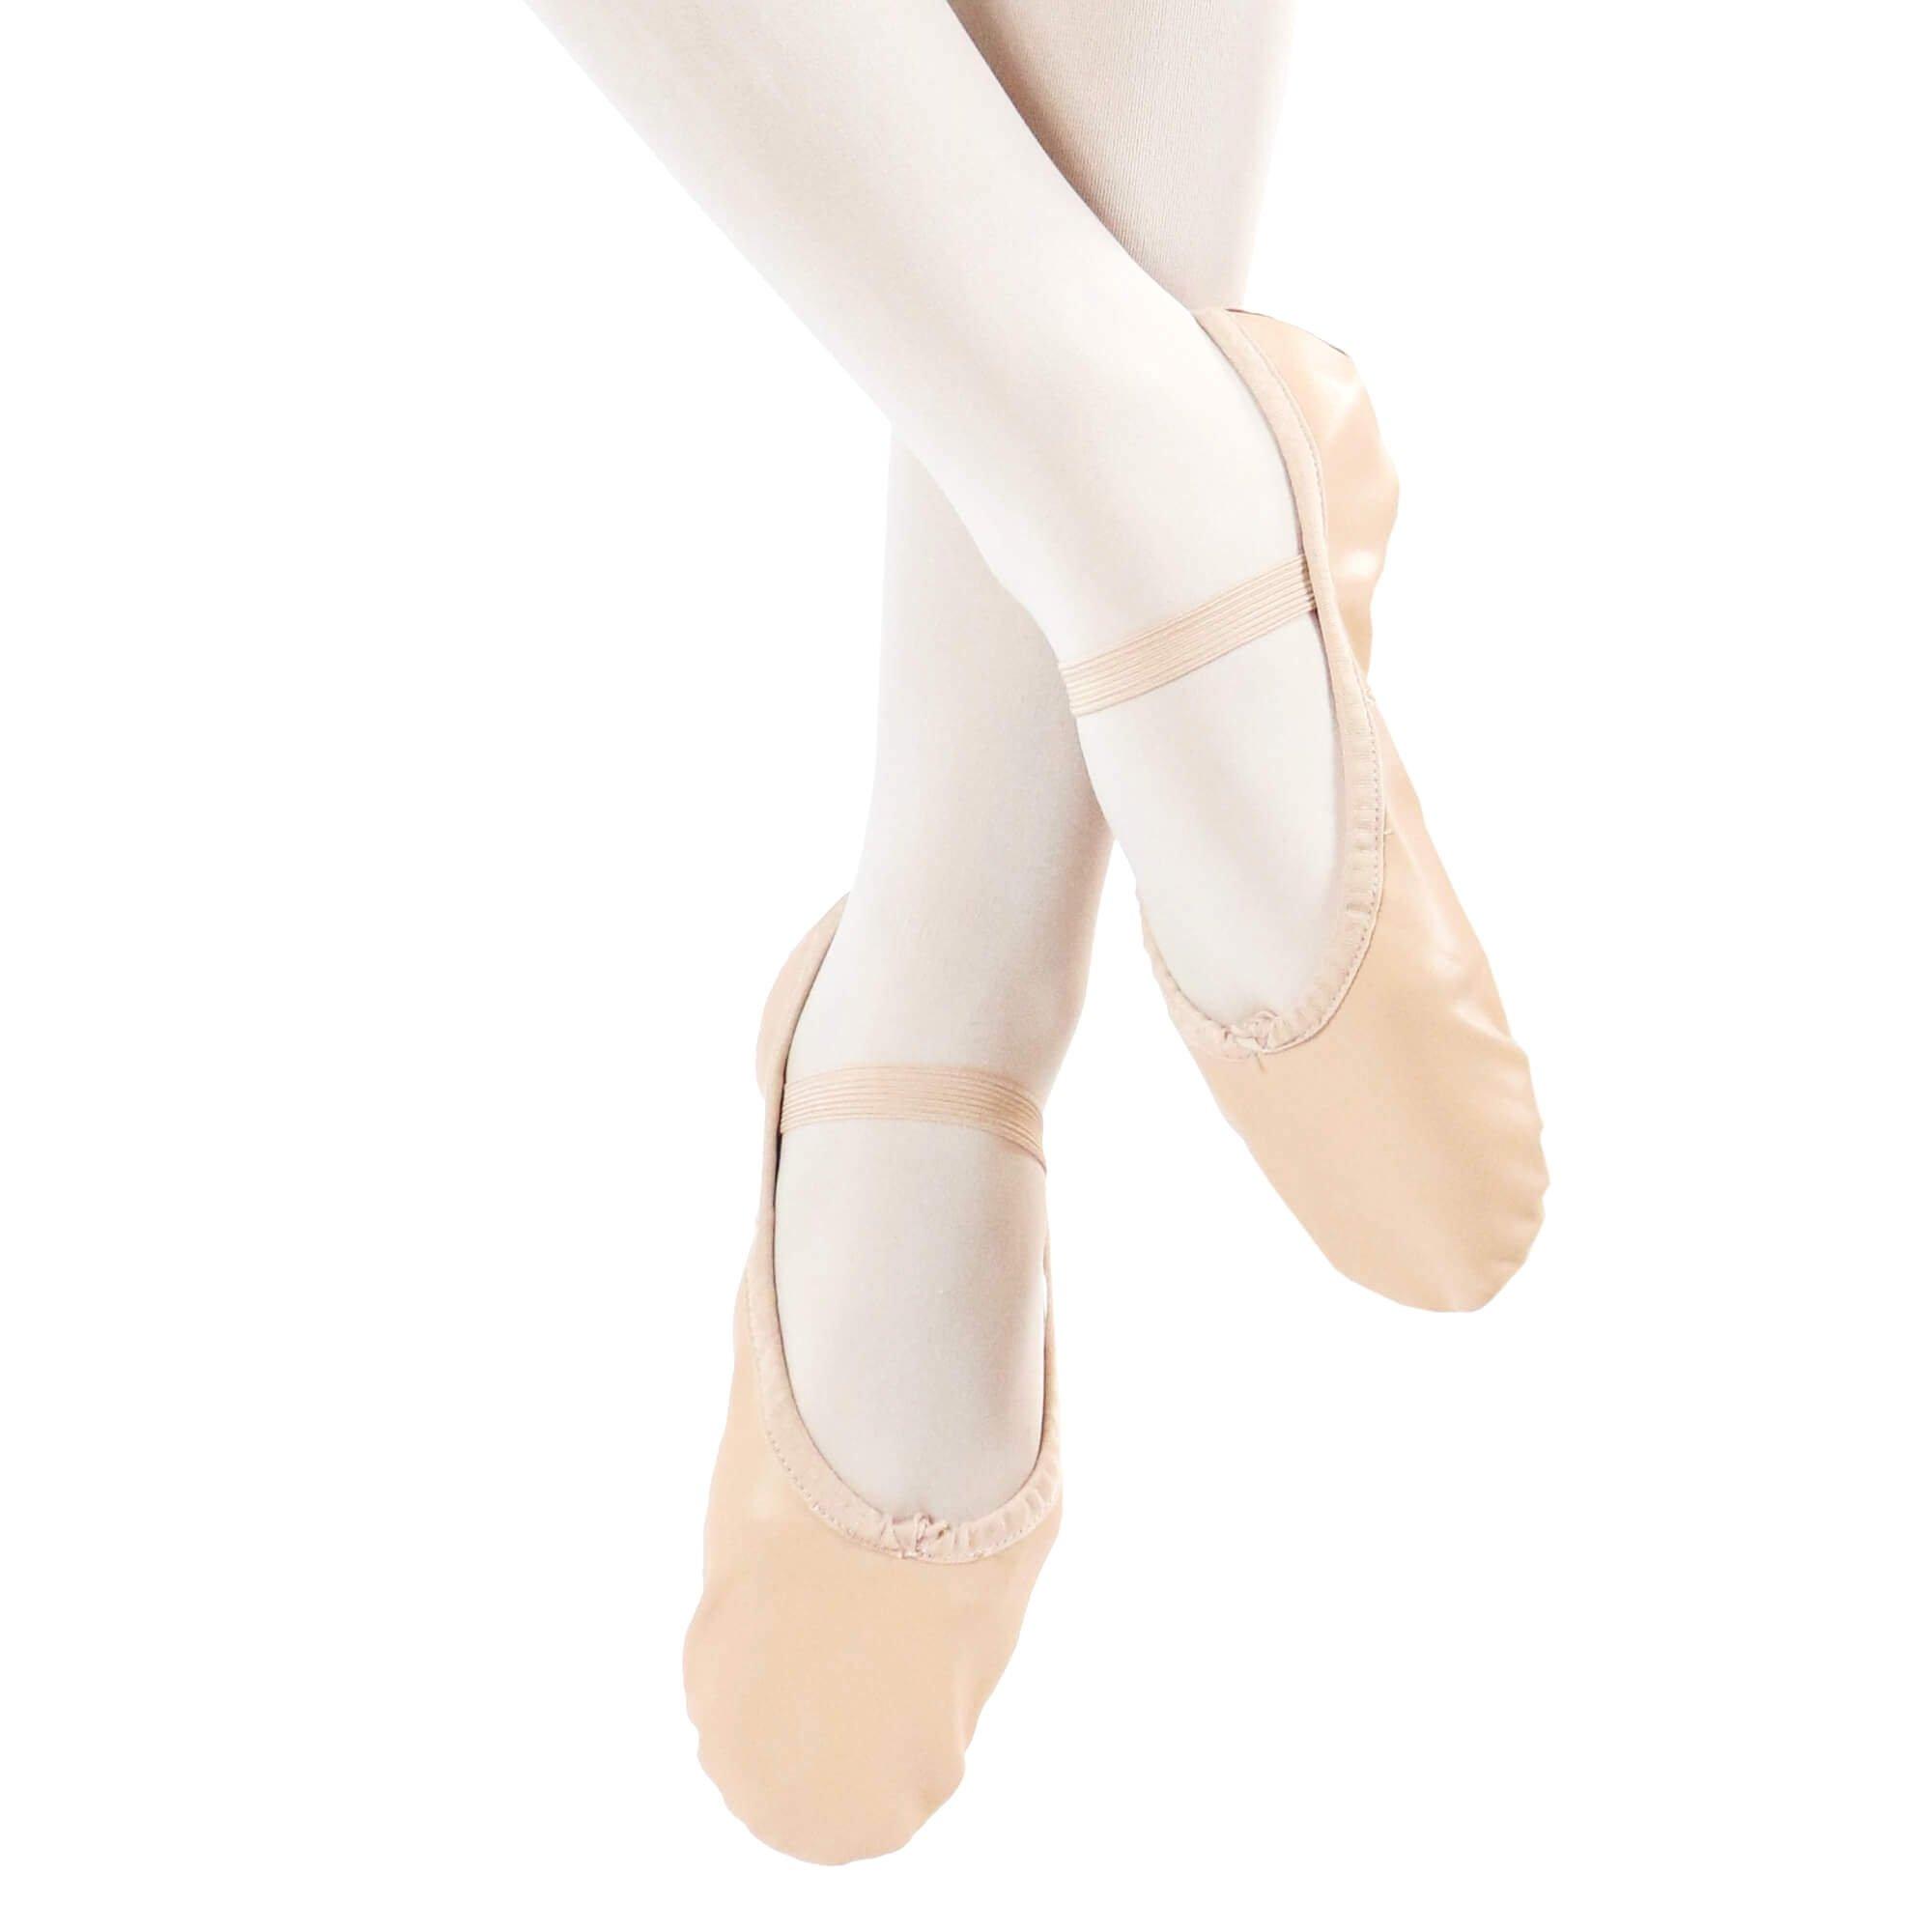 36718c8cdacc Danzcue Adult Full Sole Leather Ballet Dance Slipper